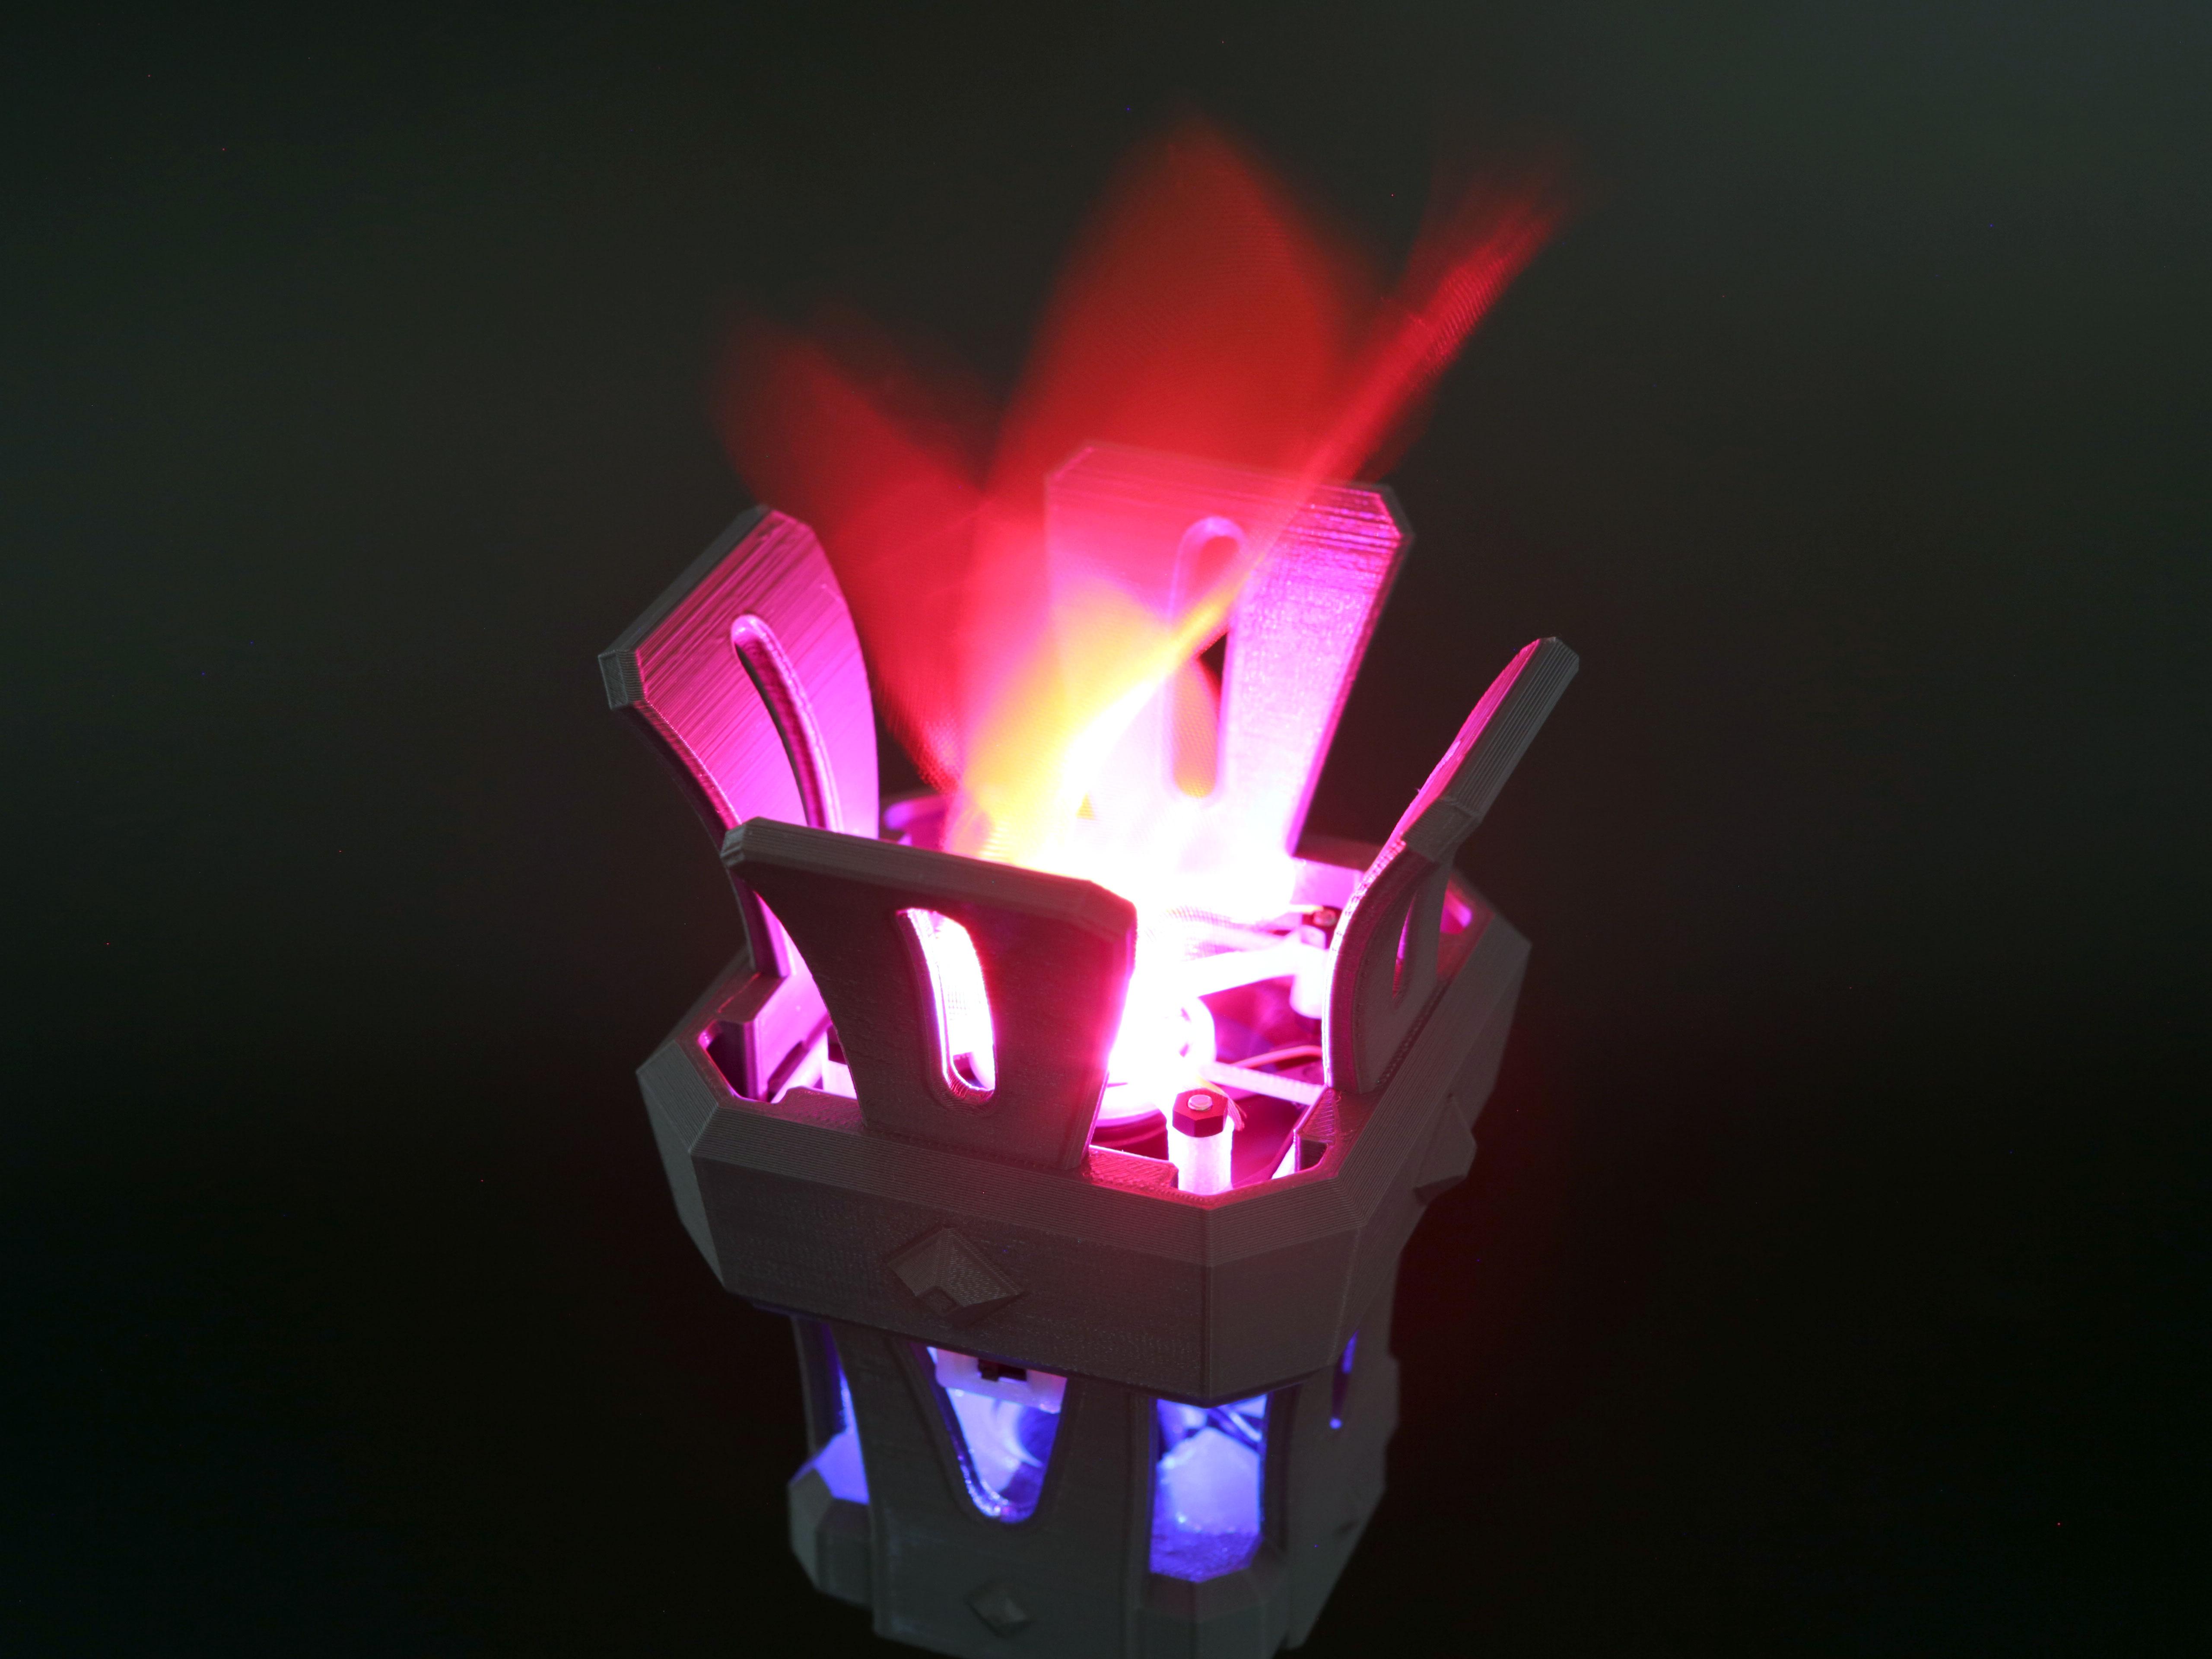 led_pixels_hero-flame-2.jpg